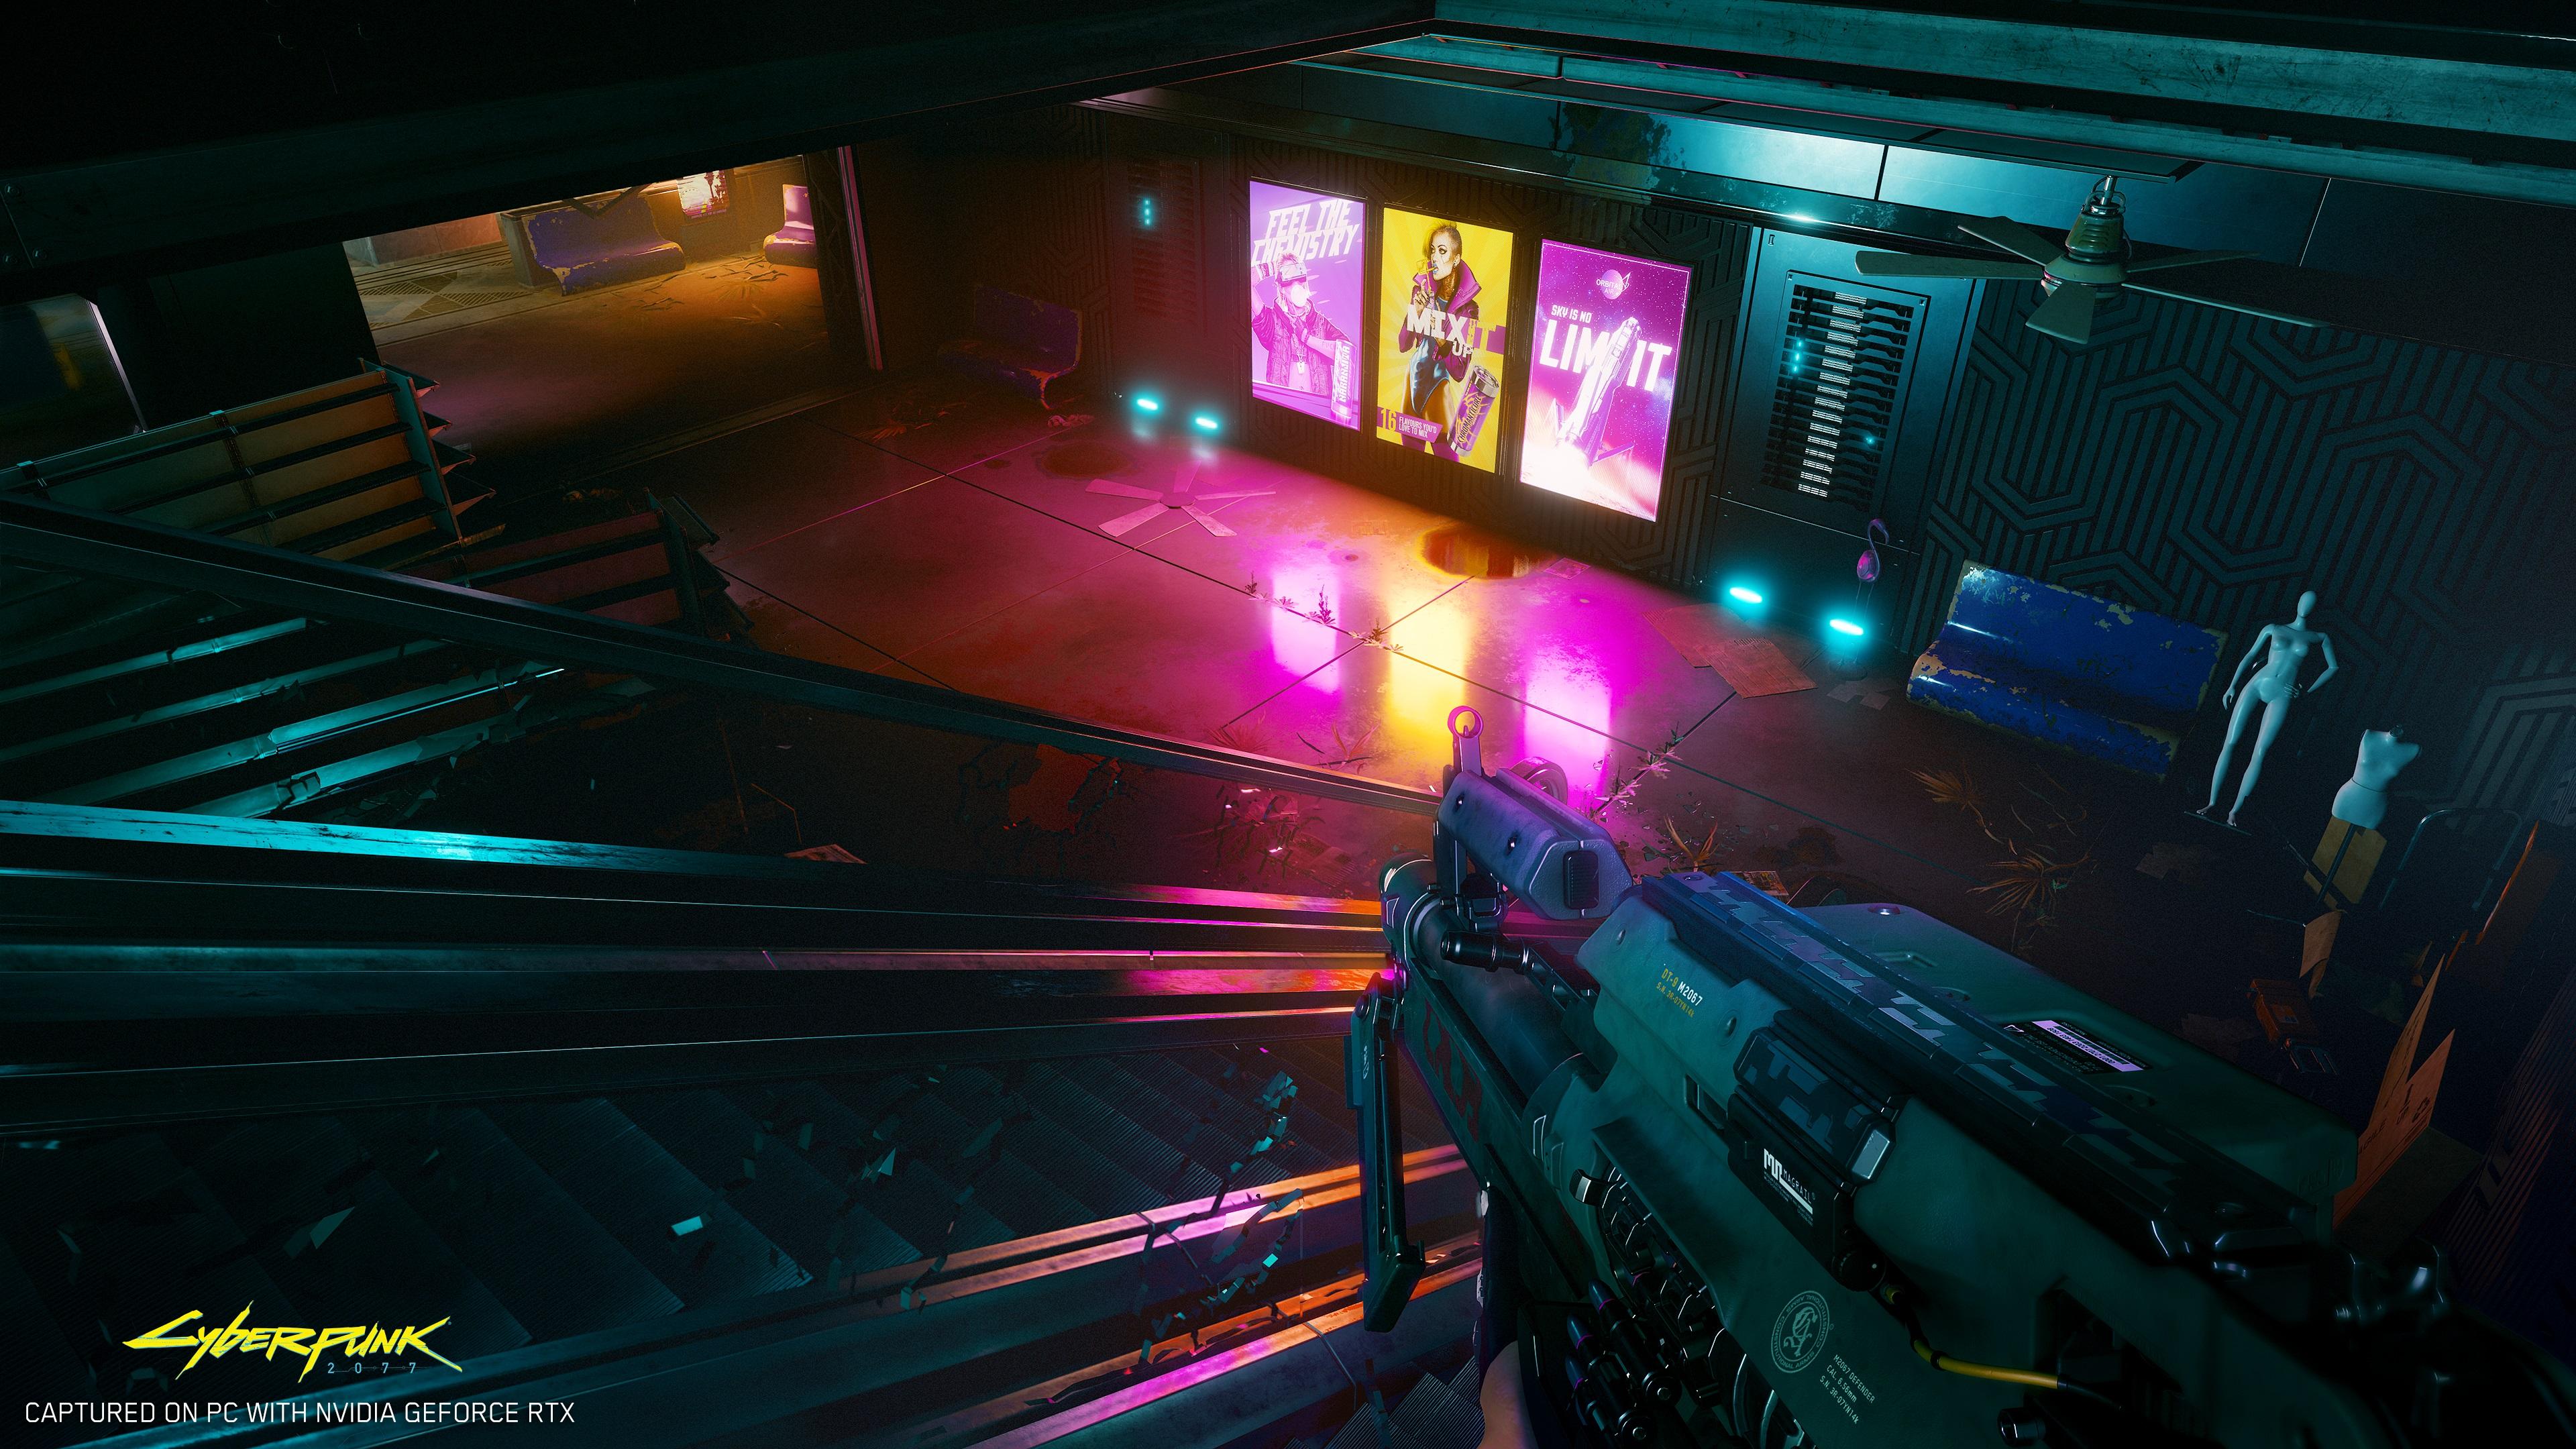 Cyberpunk 2077's E3 demo leans on unimaginative stereotypes | Rock